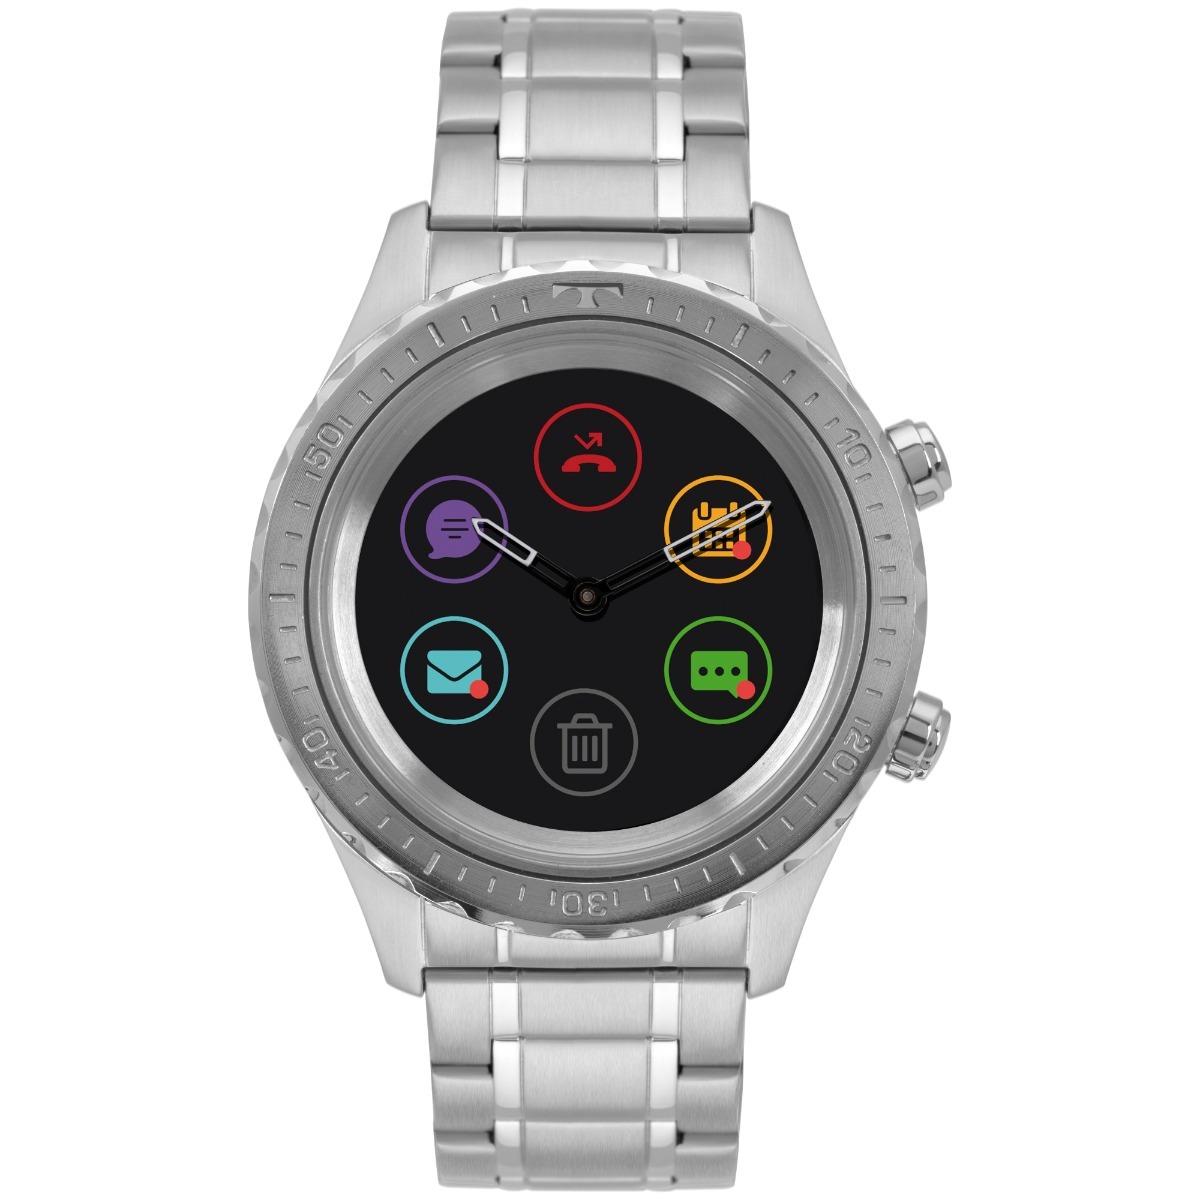 3de8b41382ec9 Relógio Technos Connect Duo P01aa 1p Smartwatch Prata 2019 - R  1.244